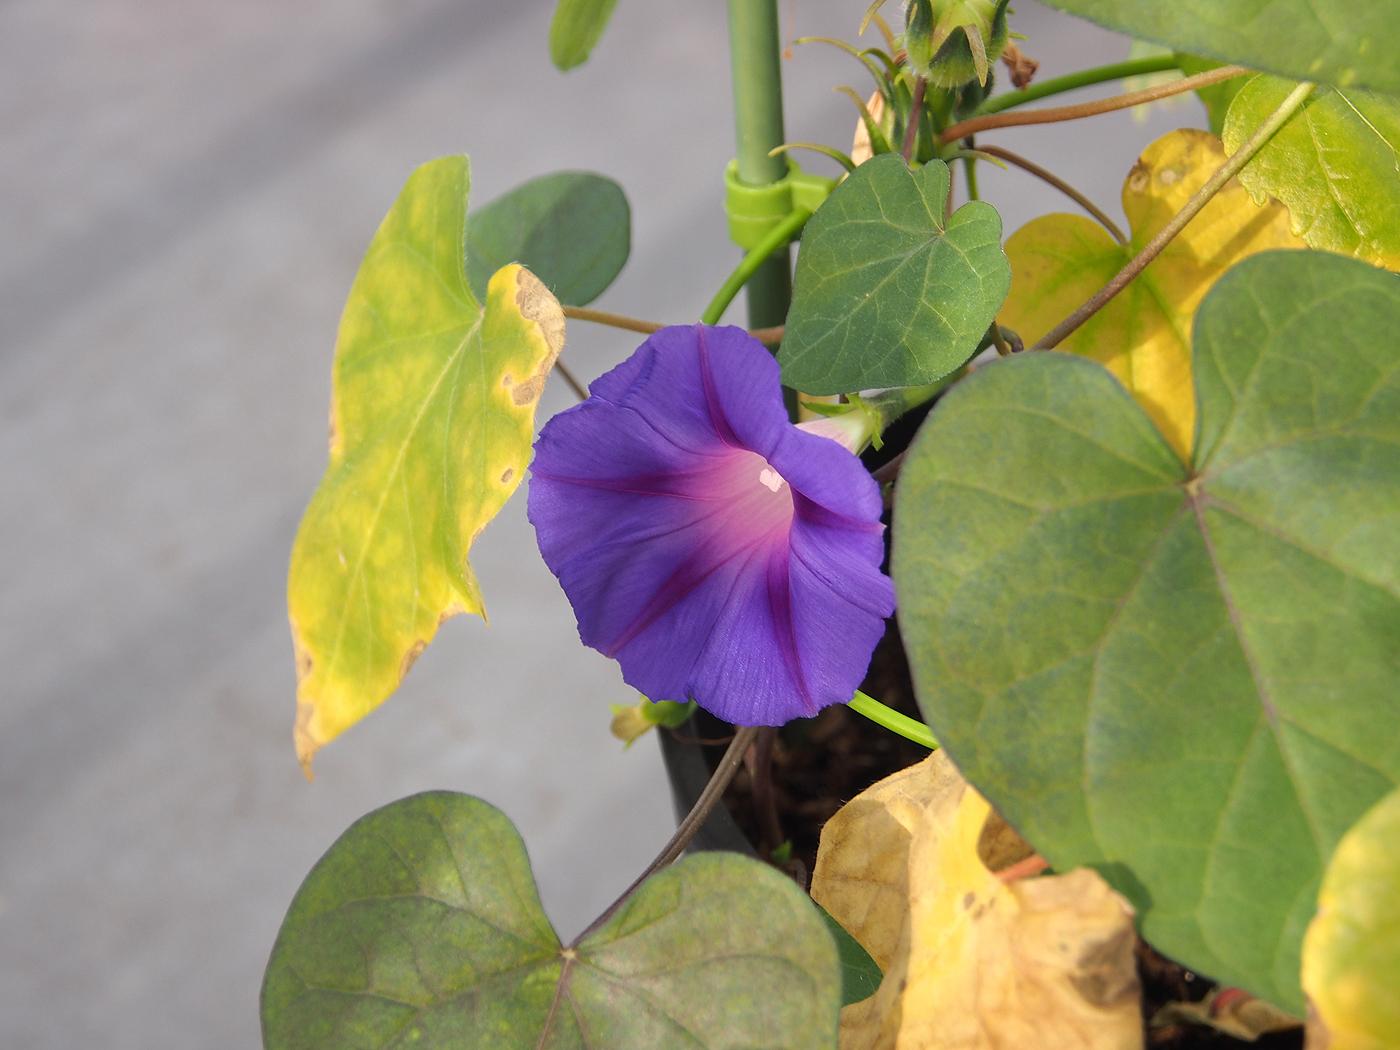 秋植え朝顔、花17、67日目